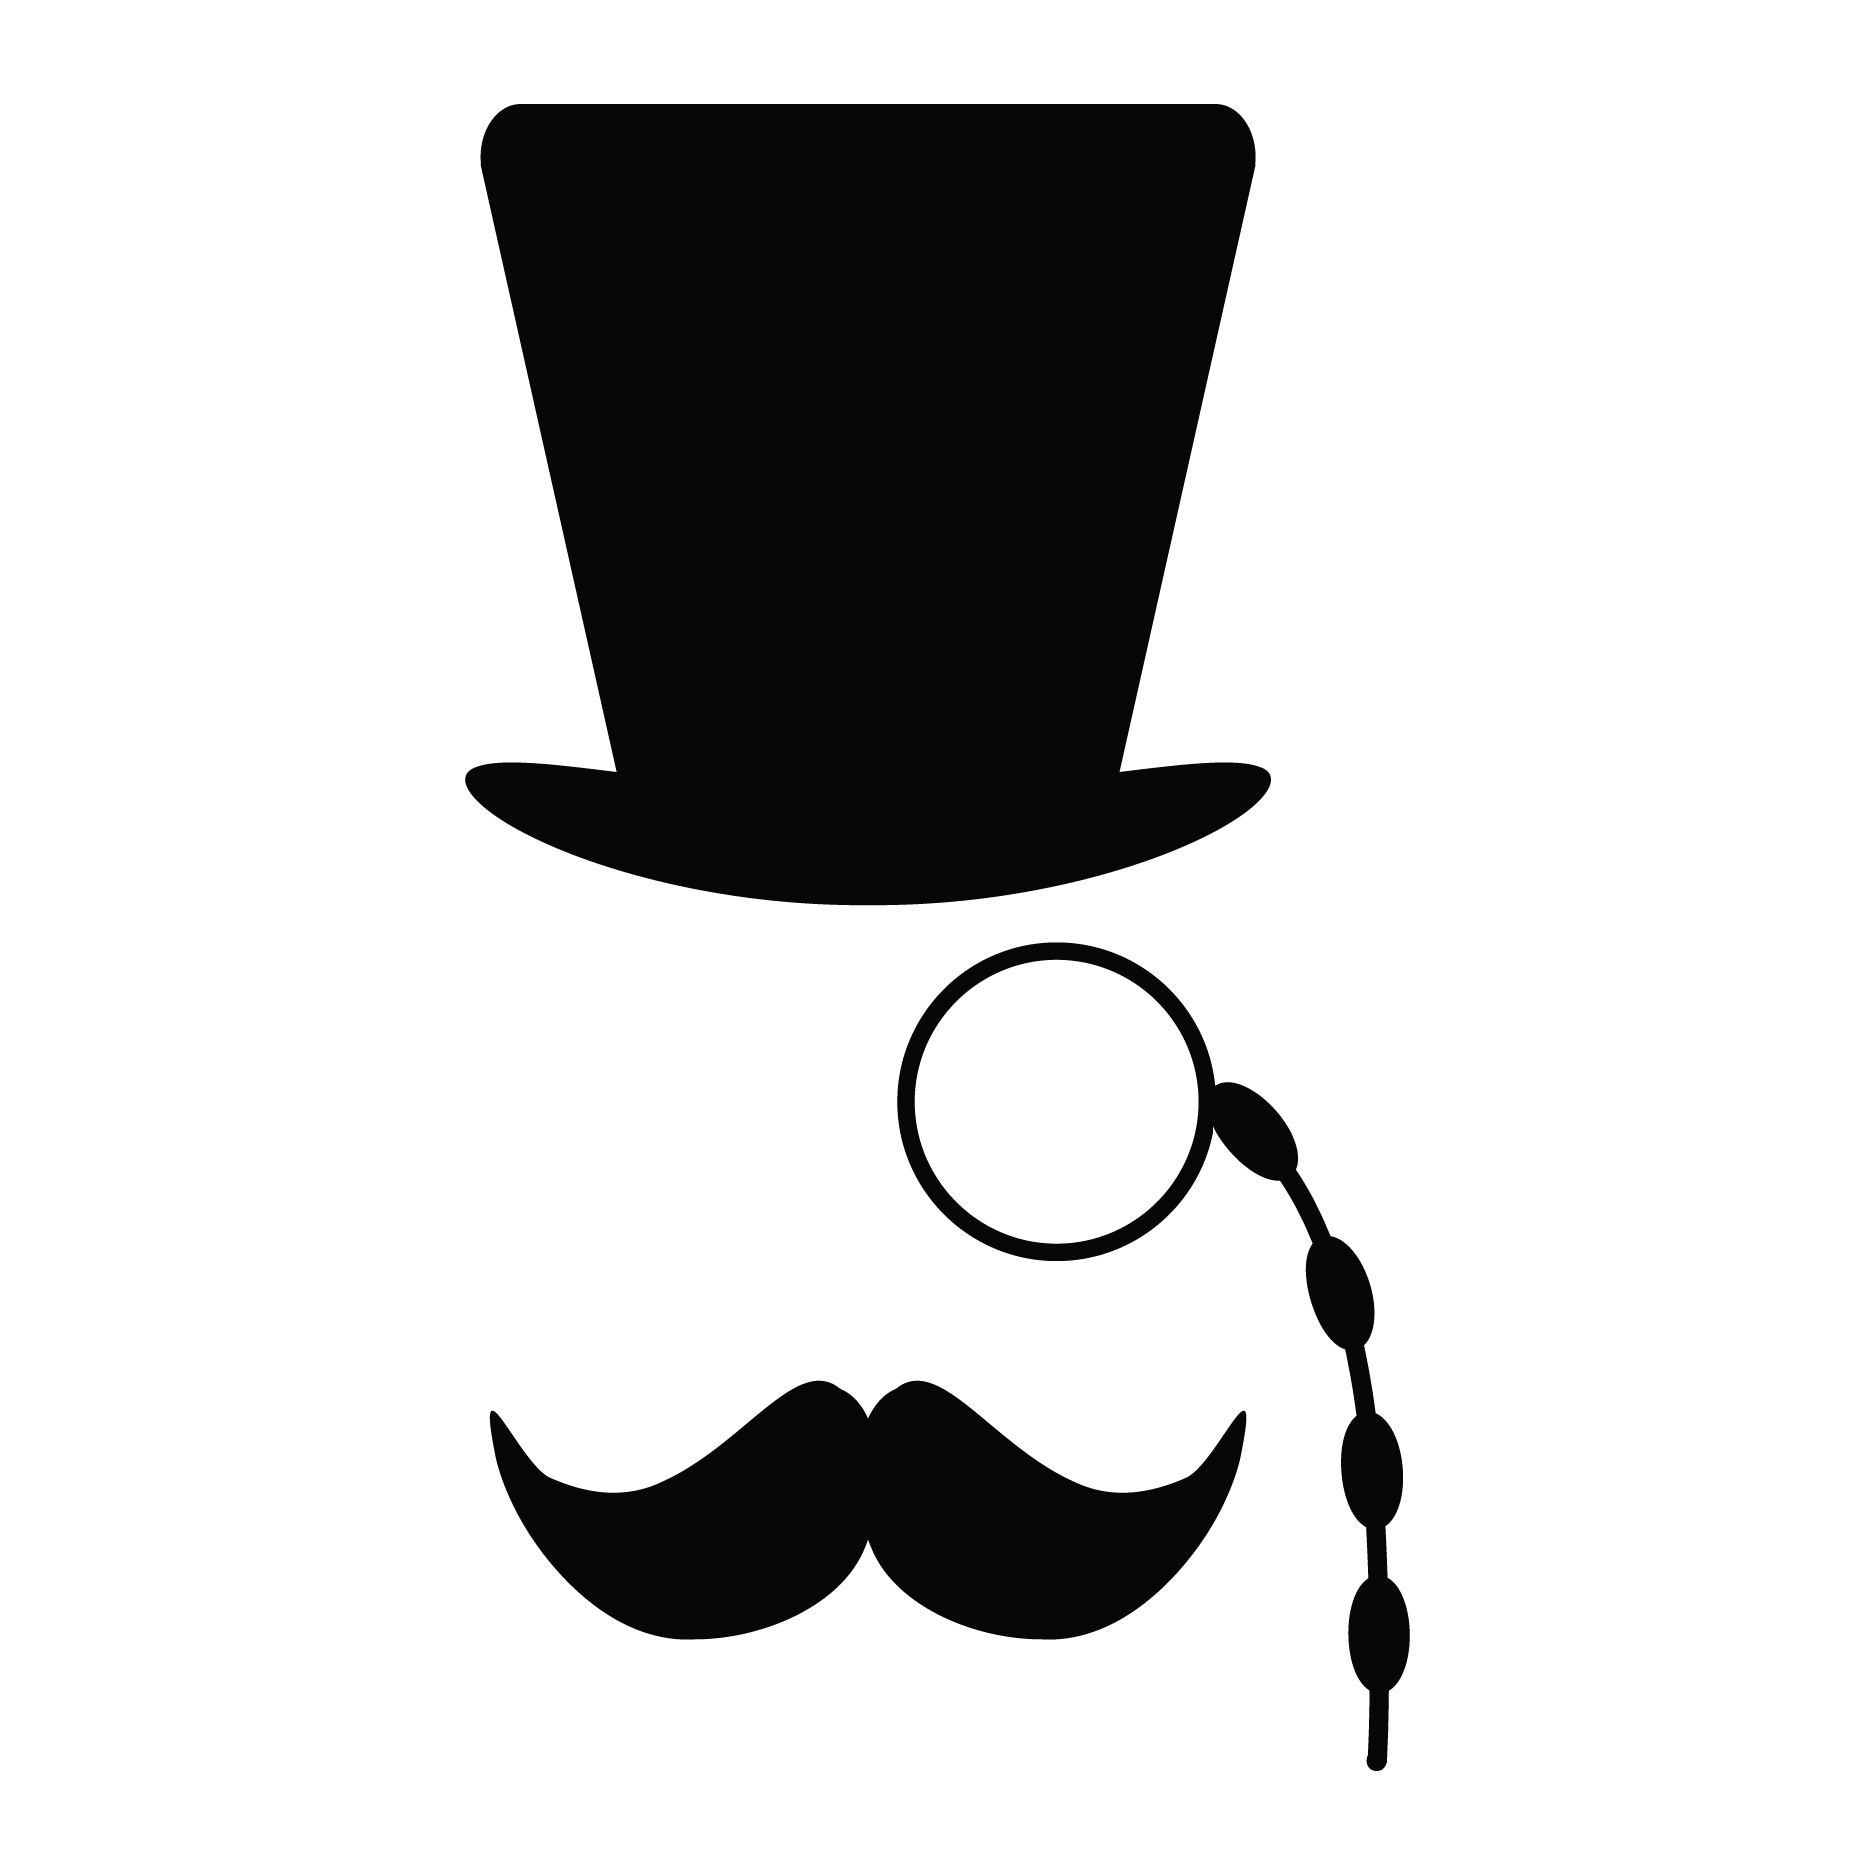 Gentleman PNG Images Transparent Free Download.